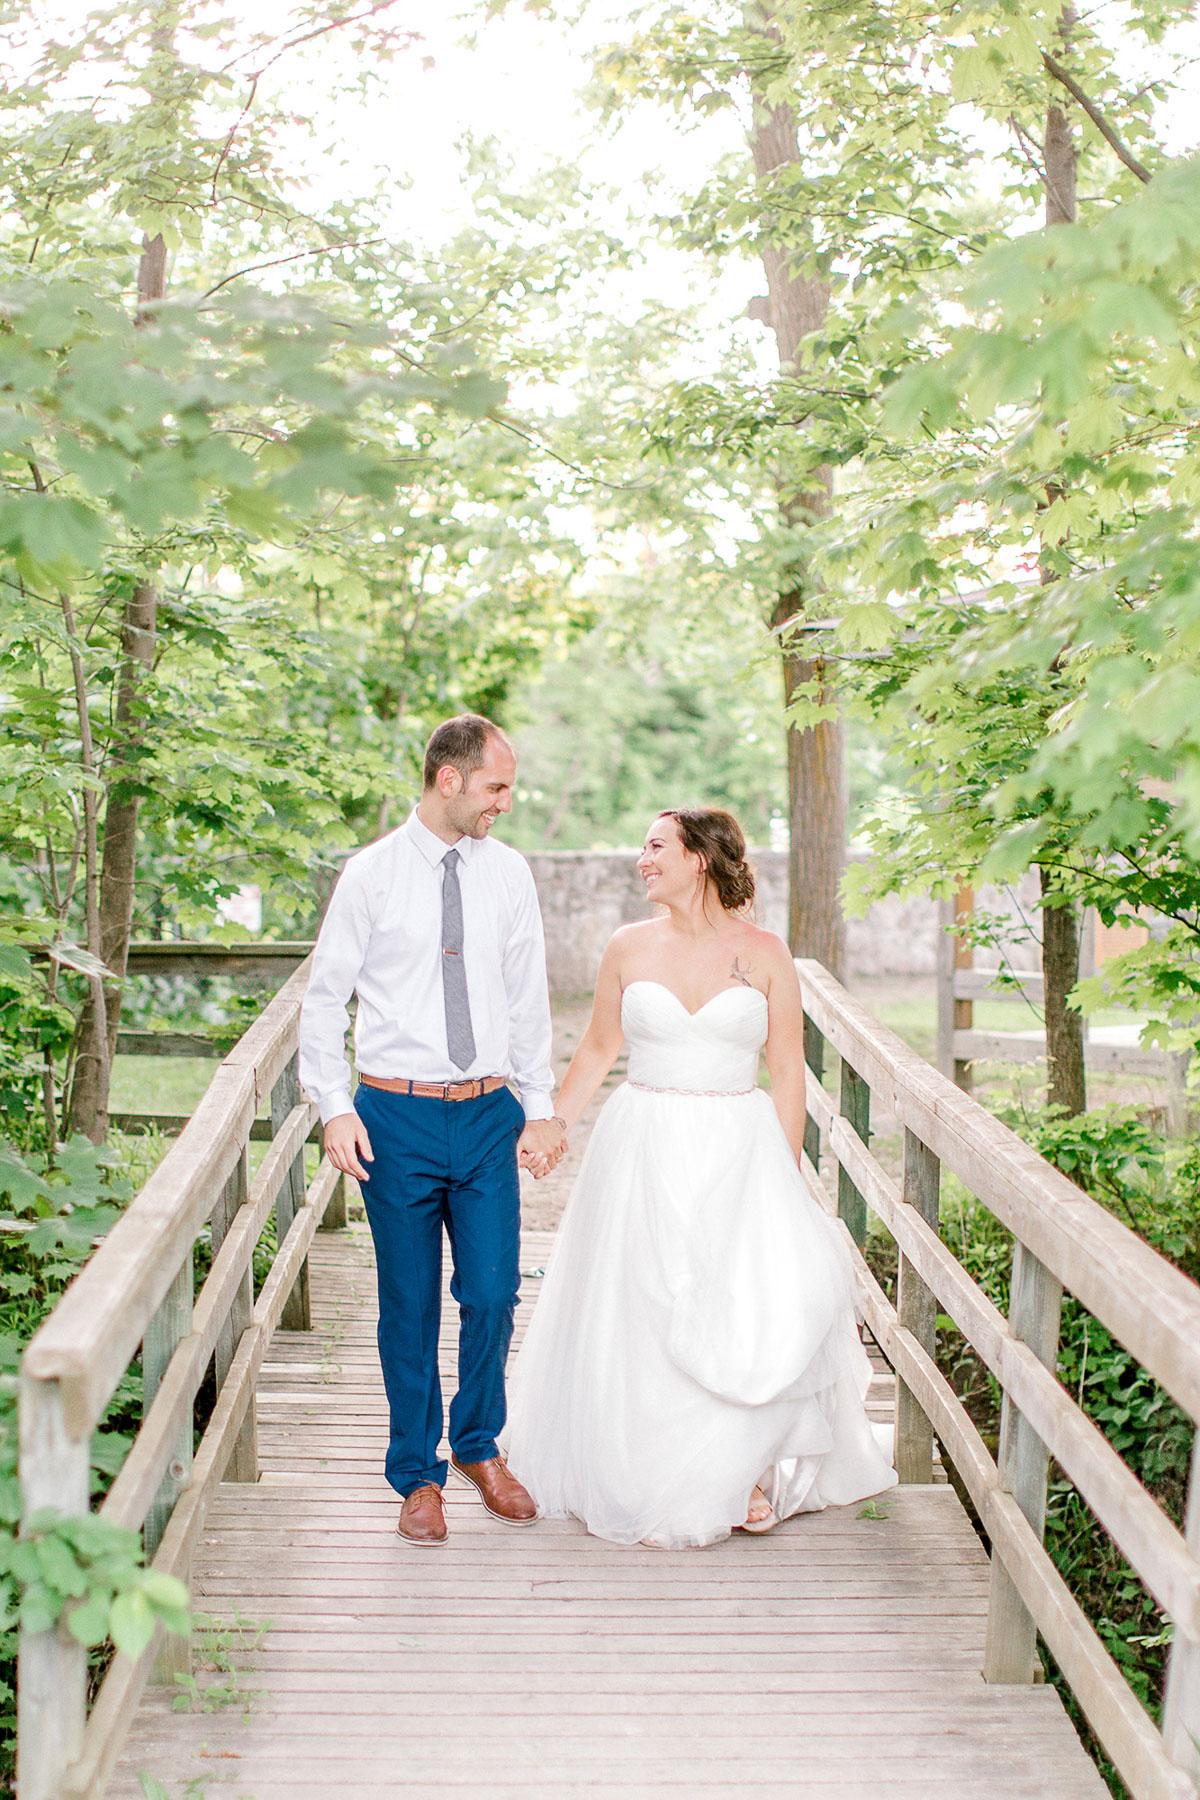 beatrice-elford-photography-vineyard-bride-swish-list-balls-falls-vineland-wedding-52.jpg